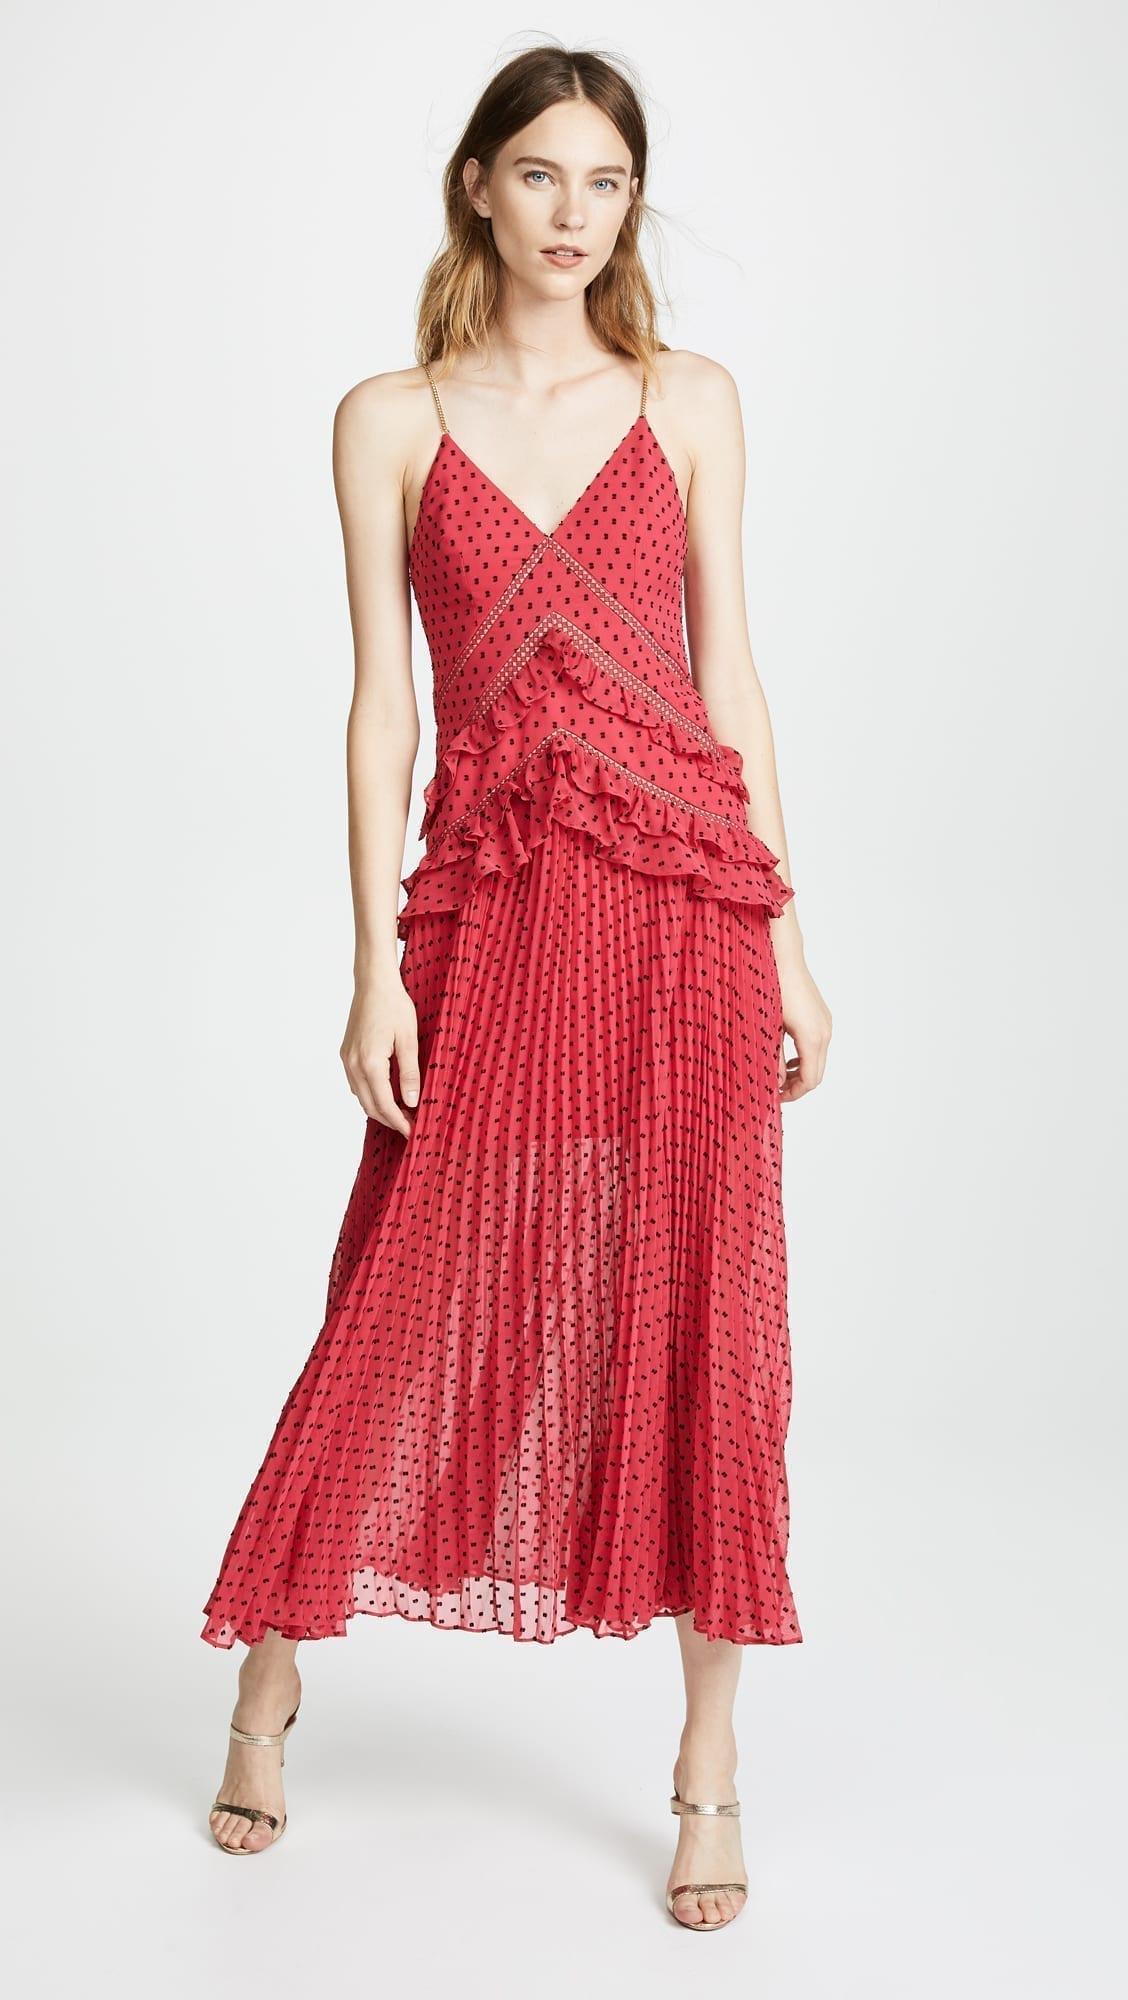 SELF PORTRAIT Panelled Maxi Fuchsia Dress